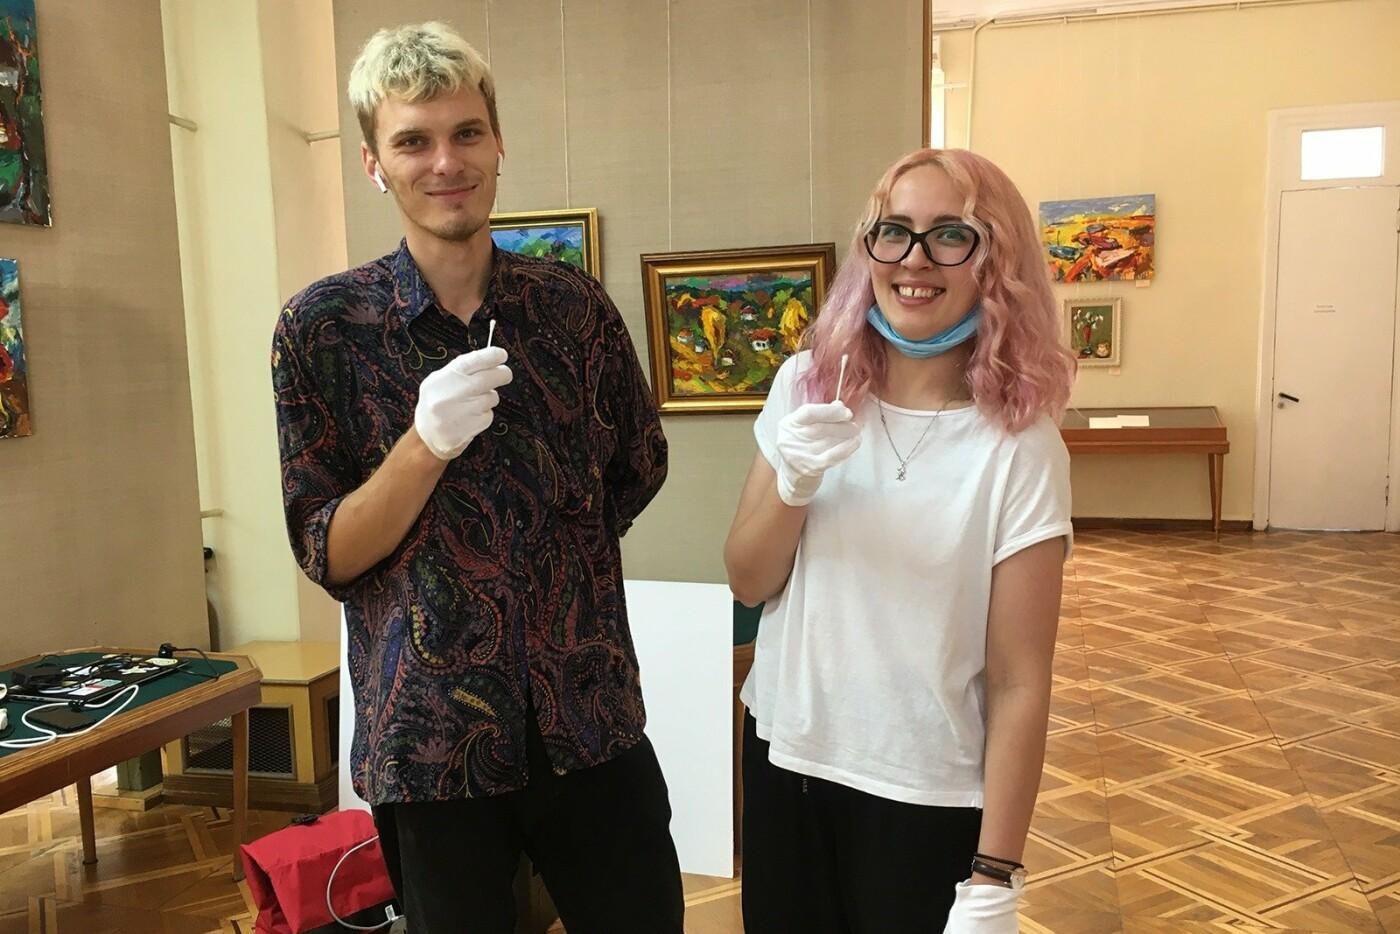 В Николаеве оцифруют и создадут  3D модели из экспонатов музея имени  Верещагина, - ФОТО , фото-6